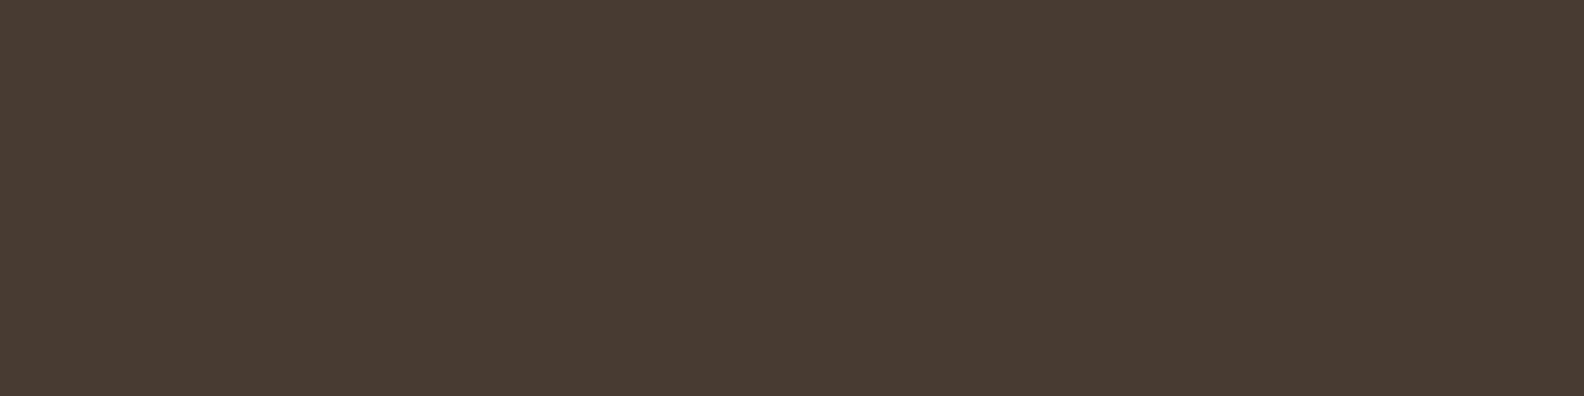 1584x396 Dark Lava Solid Color Background